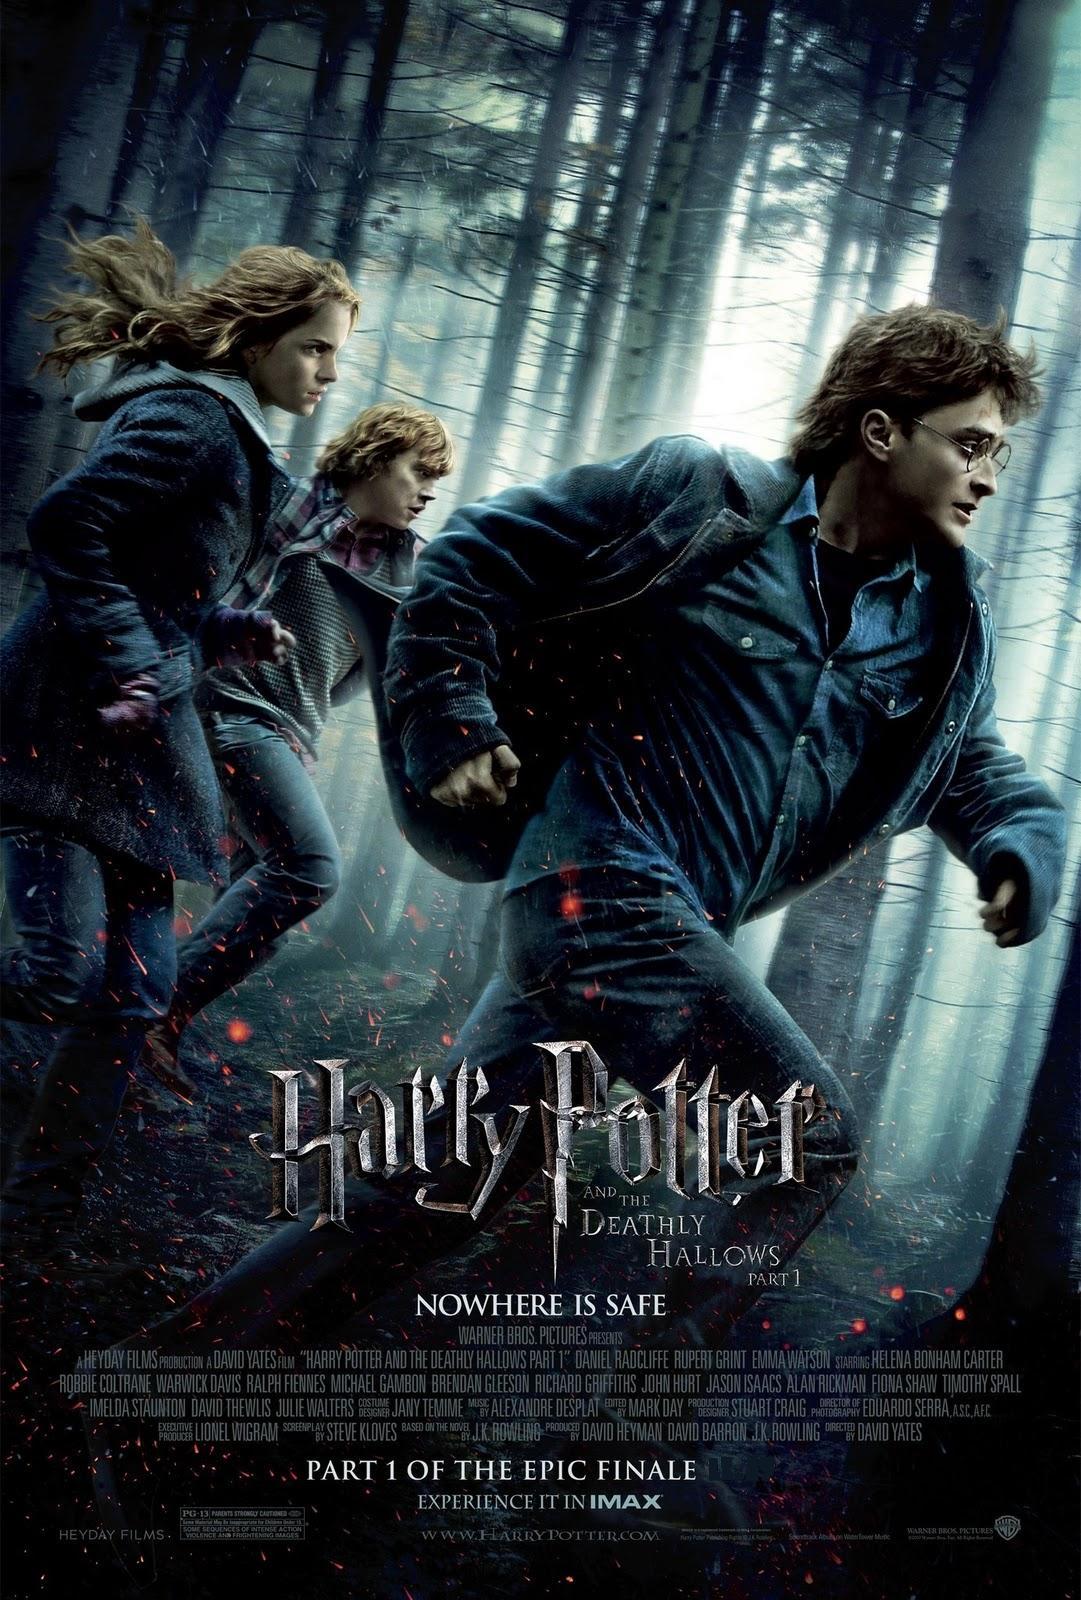 http://2.bp.blogspot.com/_SWtfCE48VEQ/TOvTF4mbDJI/AAAAAAAAAKI/gUnB0imfcsI/s1600/harry_potter_and_the_deathly_hallows_part_1_movie_poster2.jpg